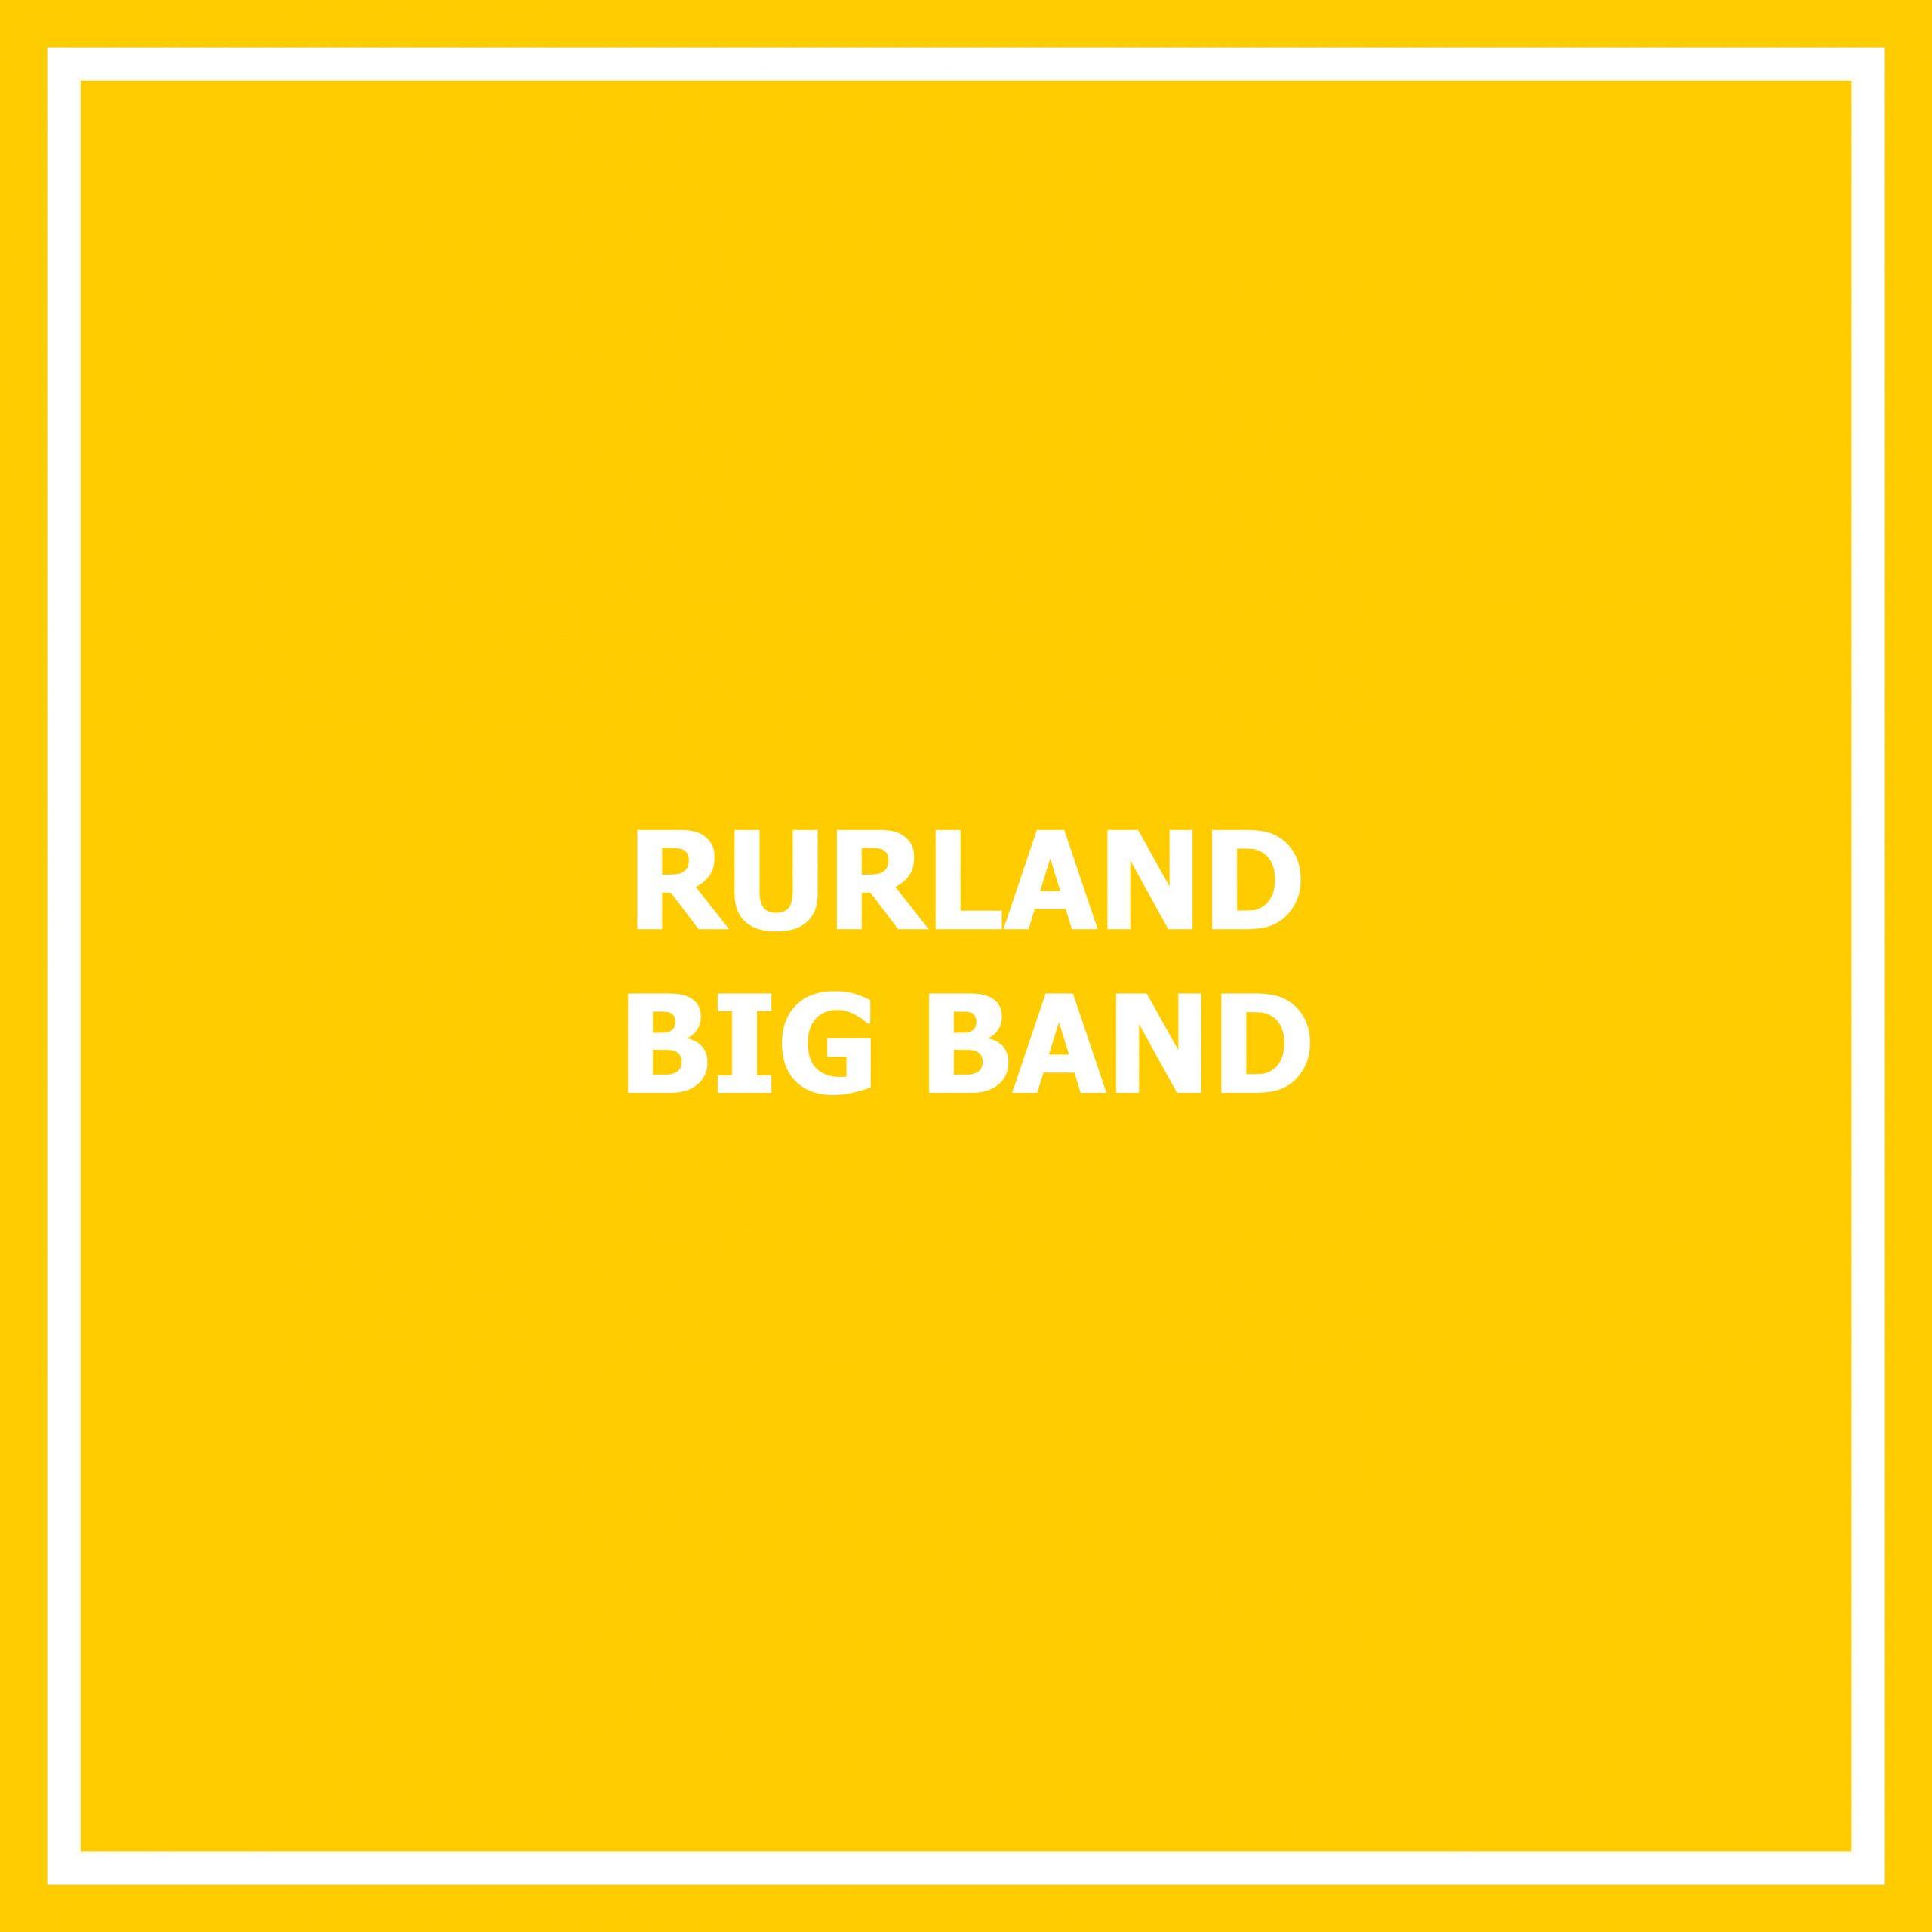 Rurland Bigband